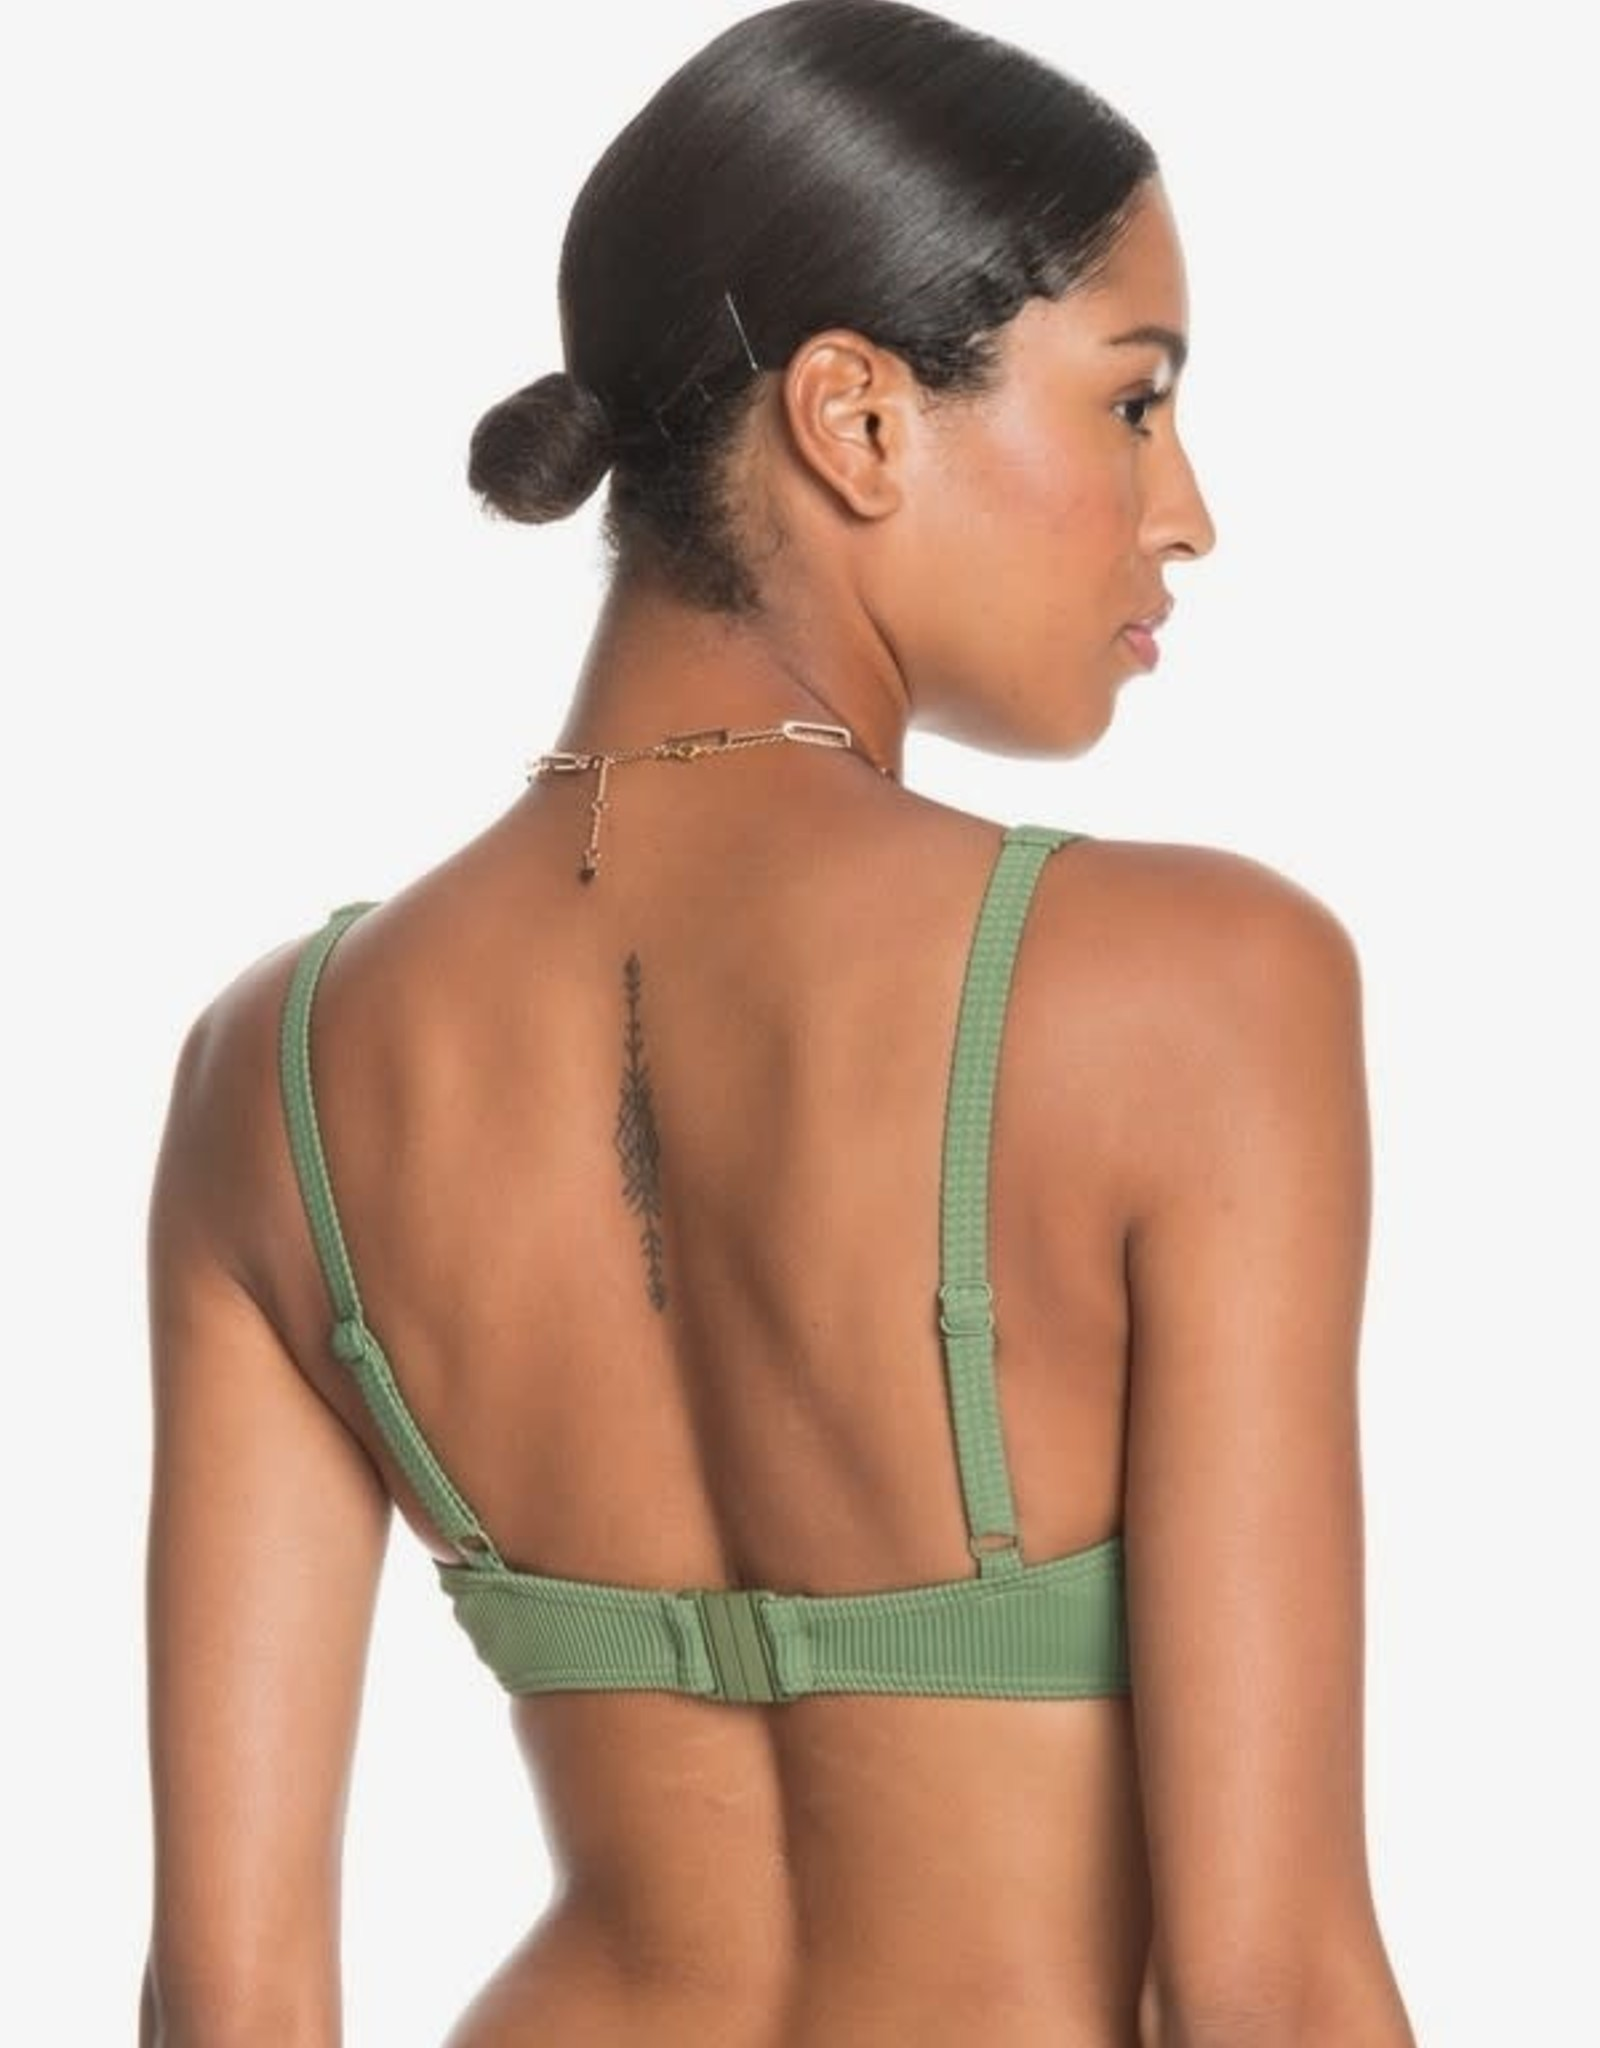 ROXY Mind Of Freedom D-Cup Underwired Bikini Top